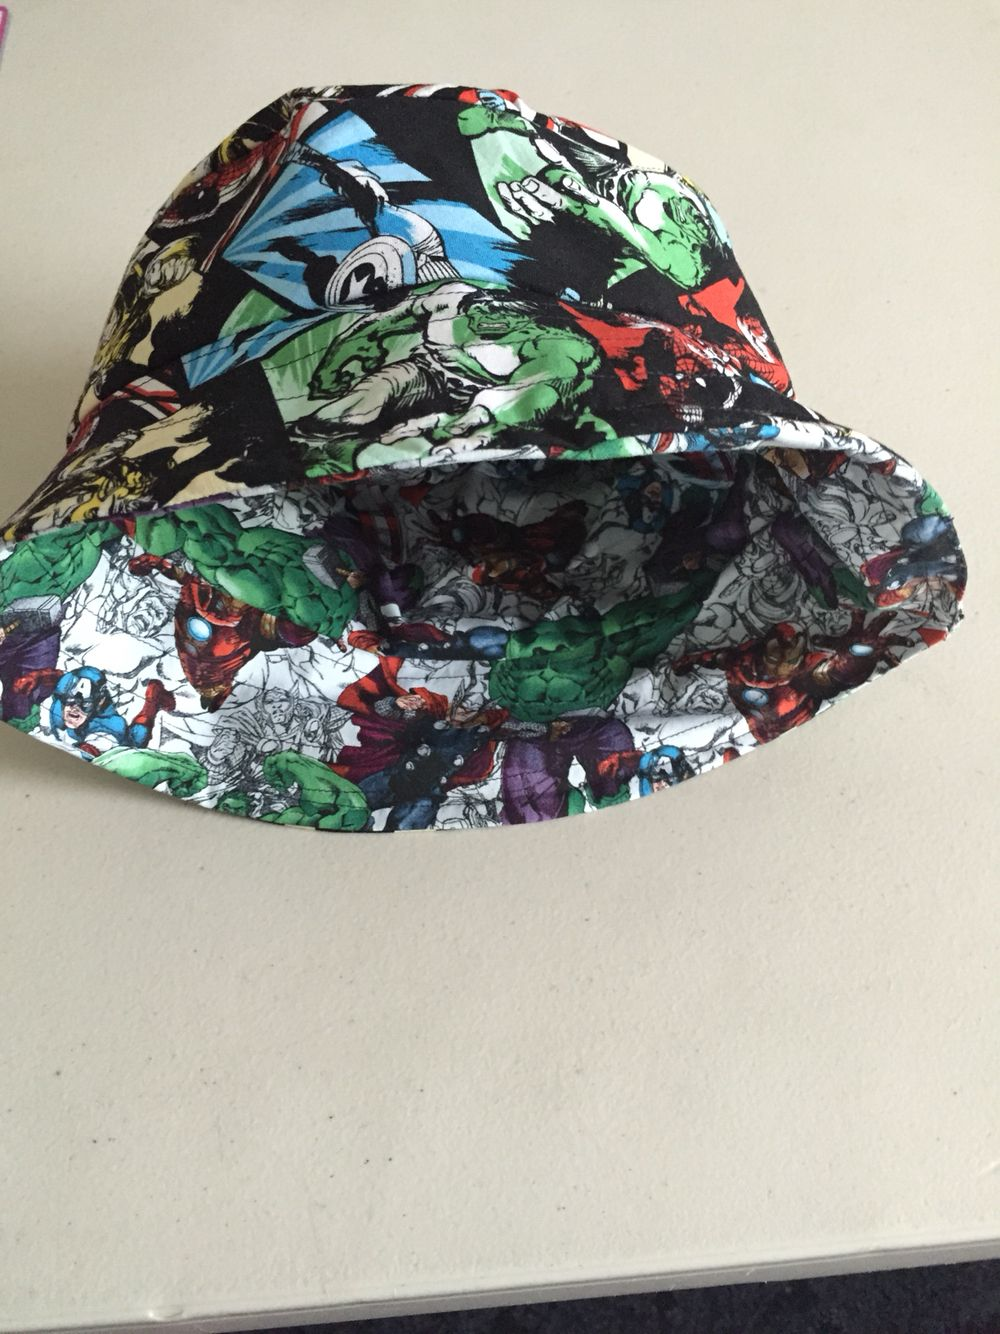 ... new zealand bucket hat with marvel avengers fabric. ec3c7 3d6f1 ... d9406cda32c